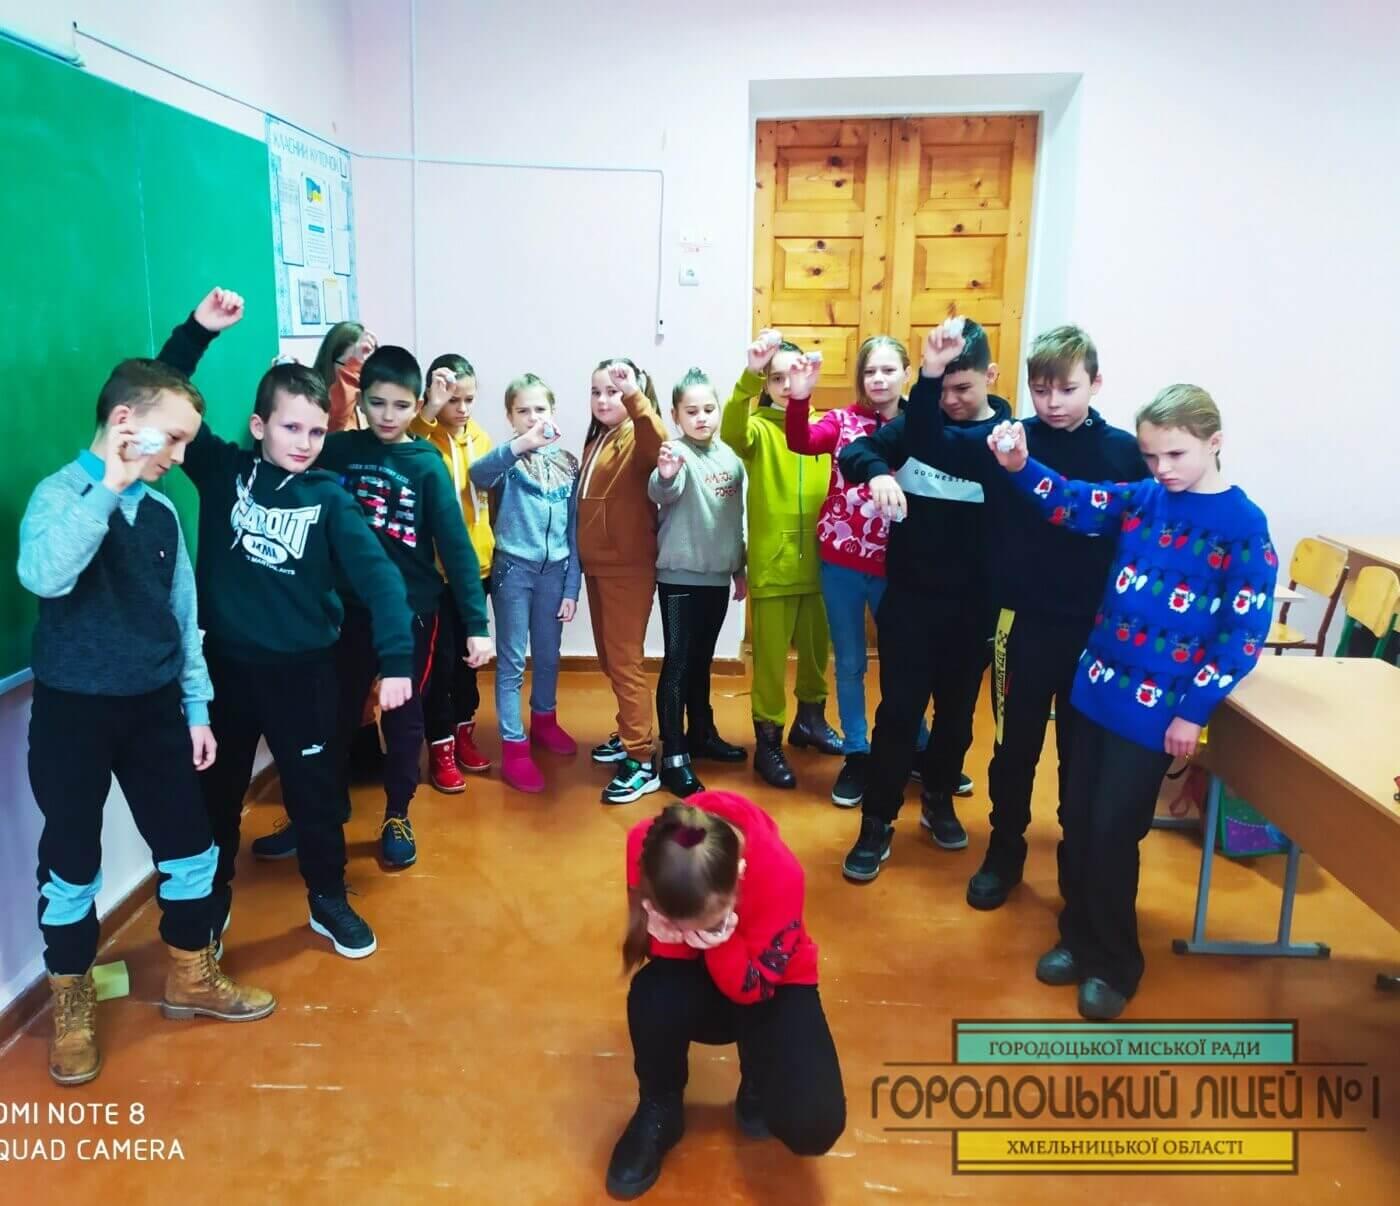 zobrazhennya viber 2020 12 09 21 13 23 1400x1206 - Діти проти насилля